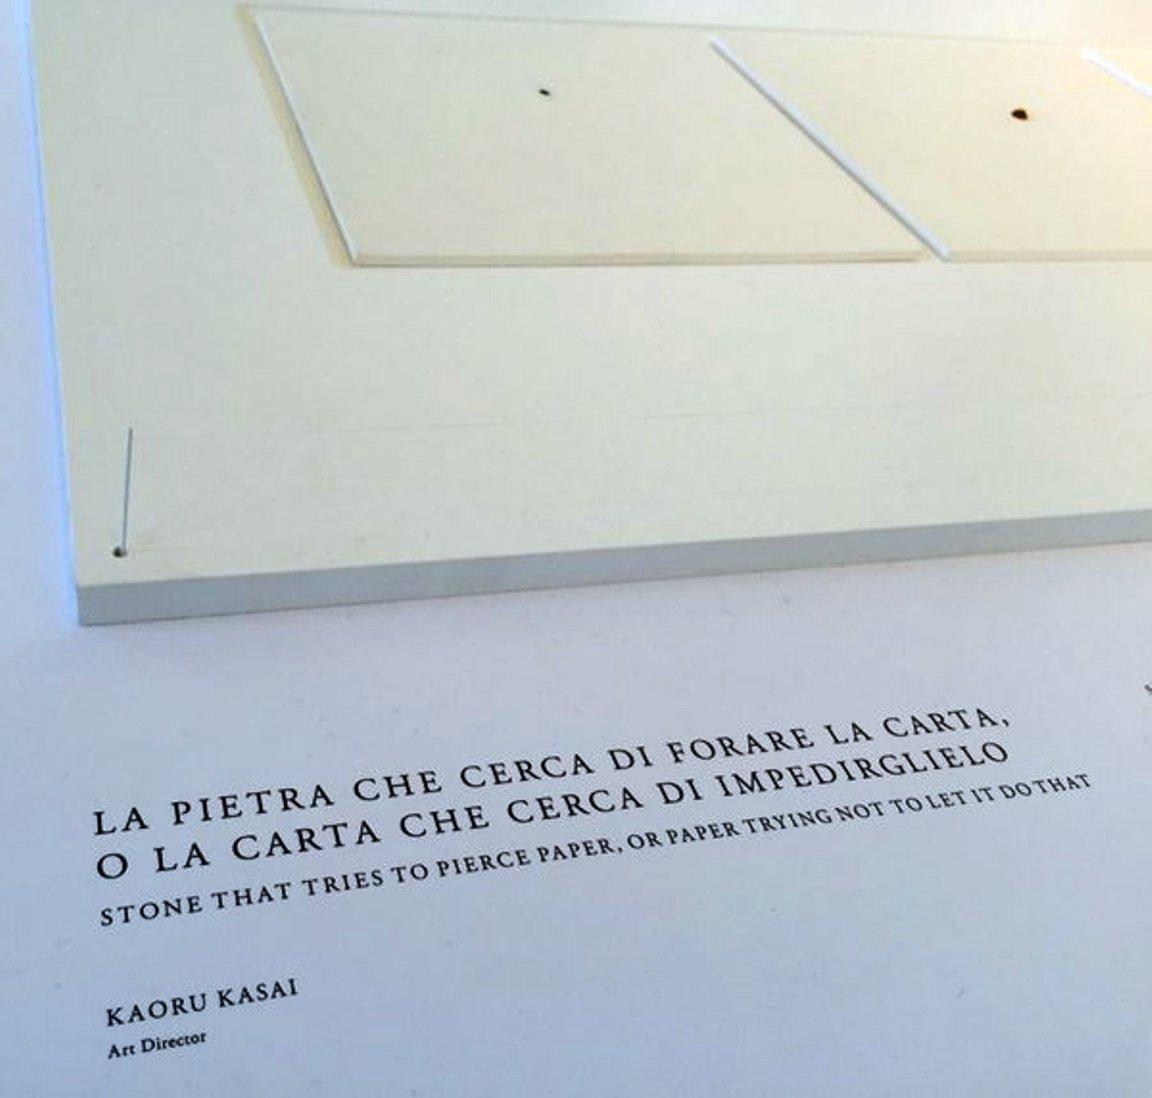 karoli kasai stone triennale salone milan 2016 (1)